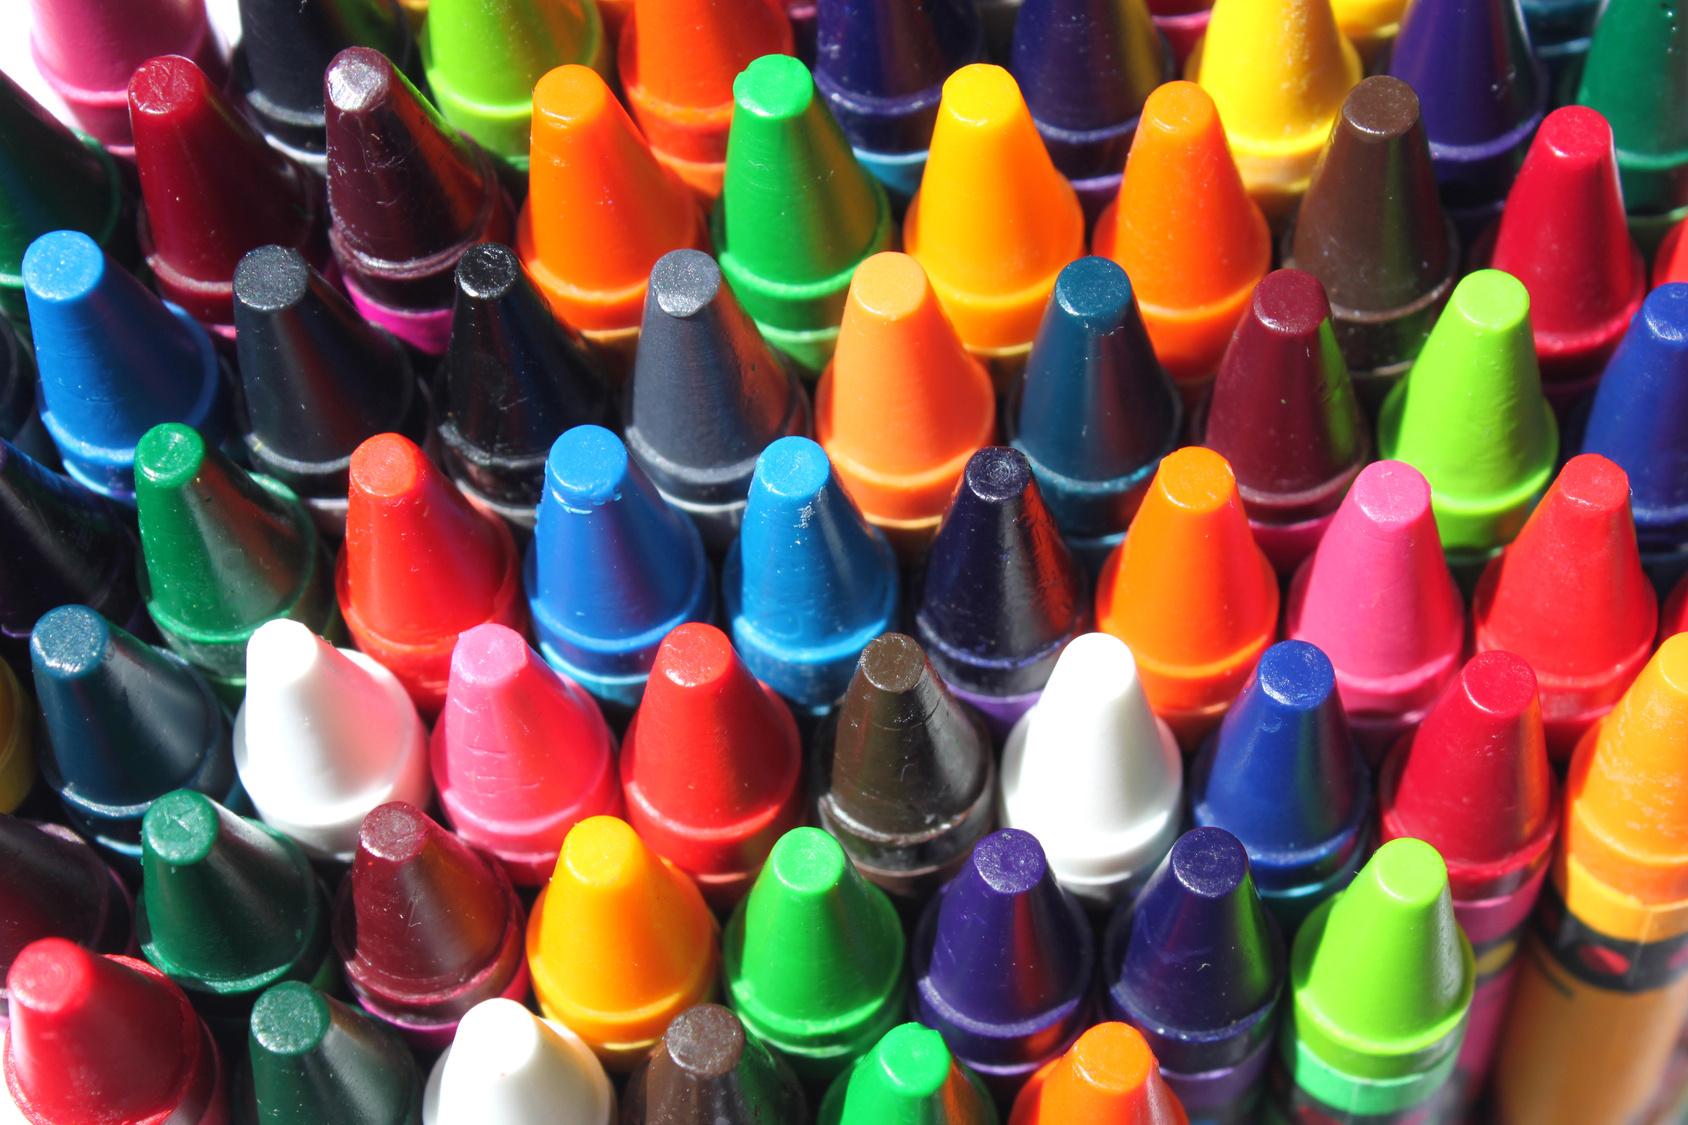 Crayons Fotolia_24551533_M.jpg